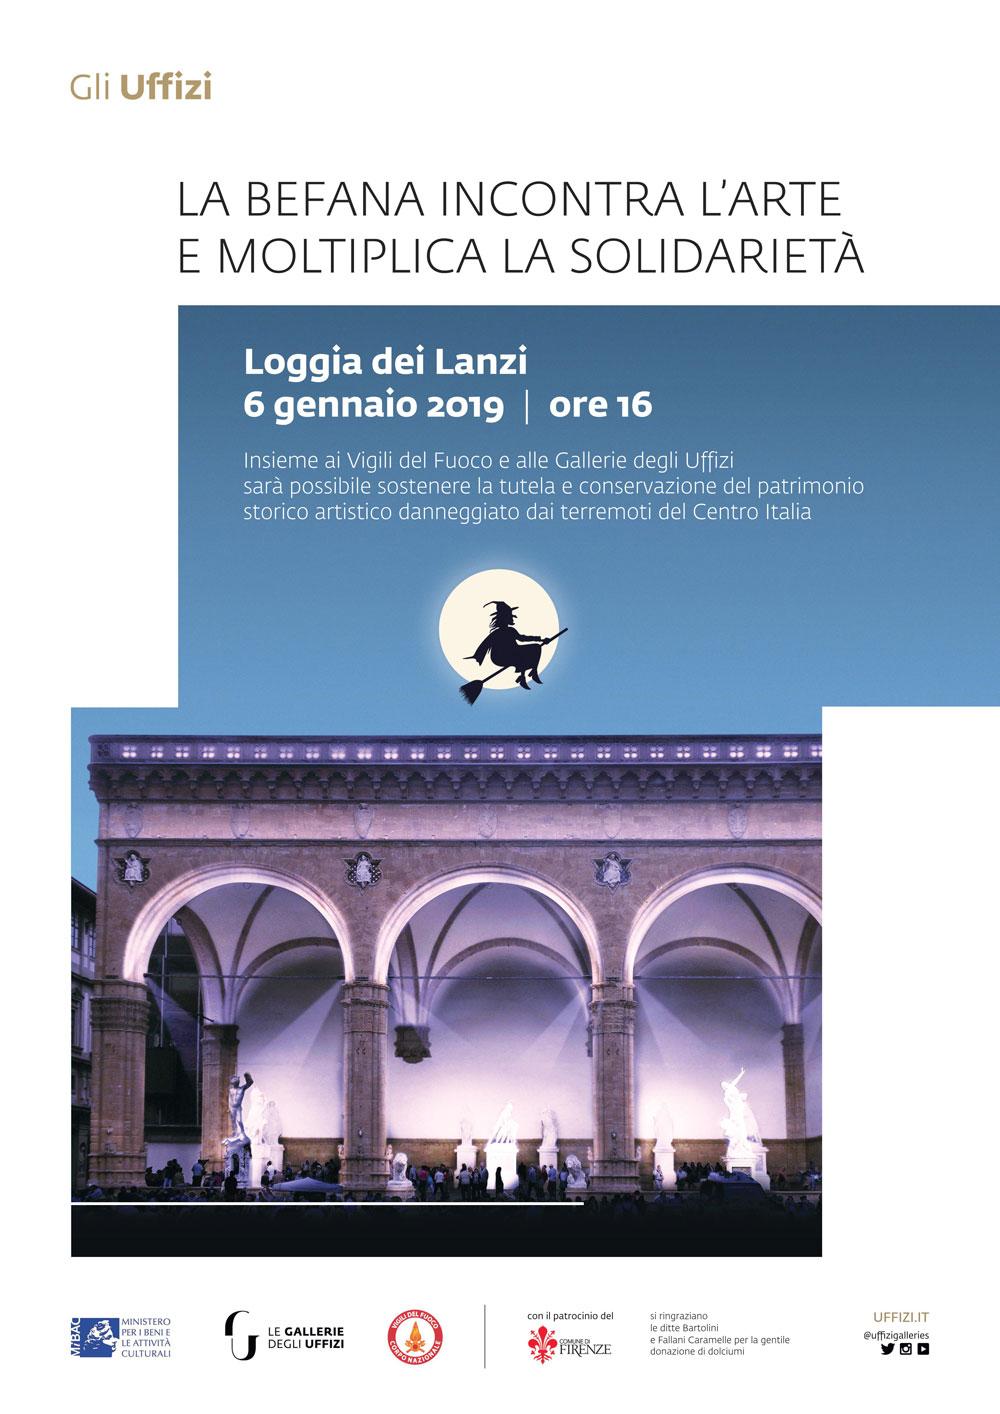 Una Befana acrobatica e di solidarietà è attesa alla Loggia dei Lanzi a Firenze